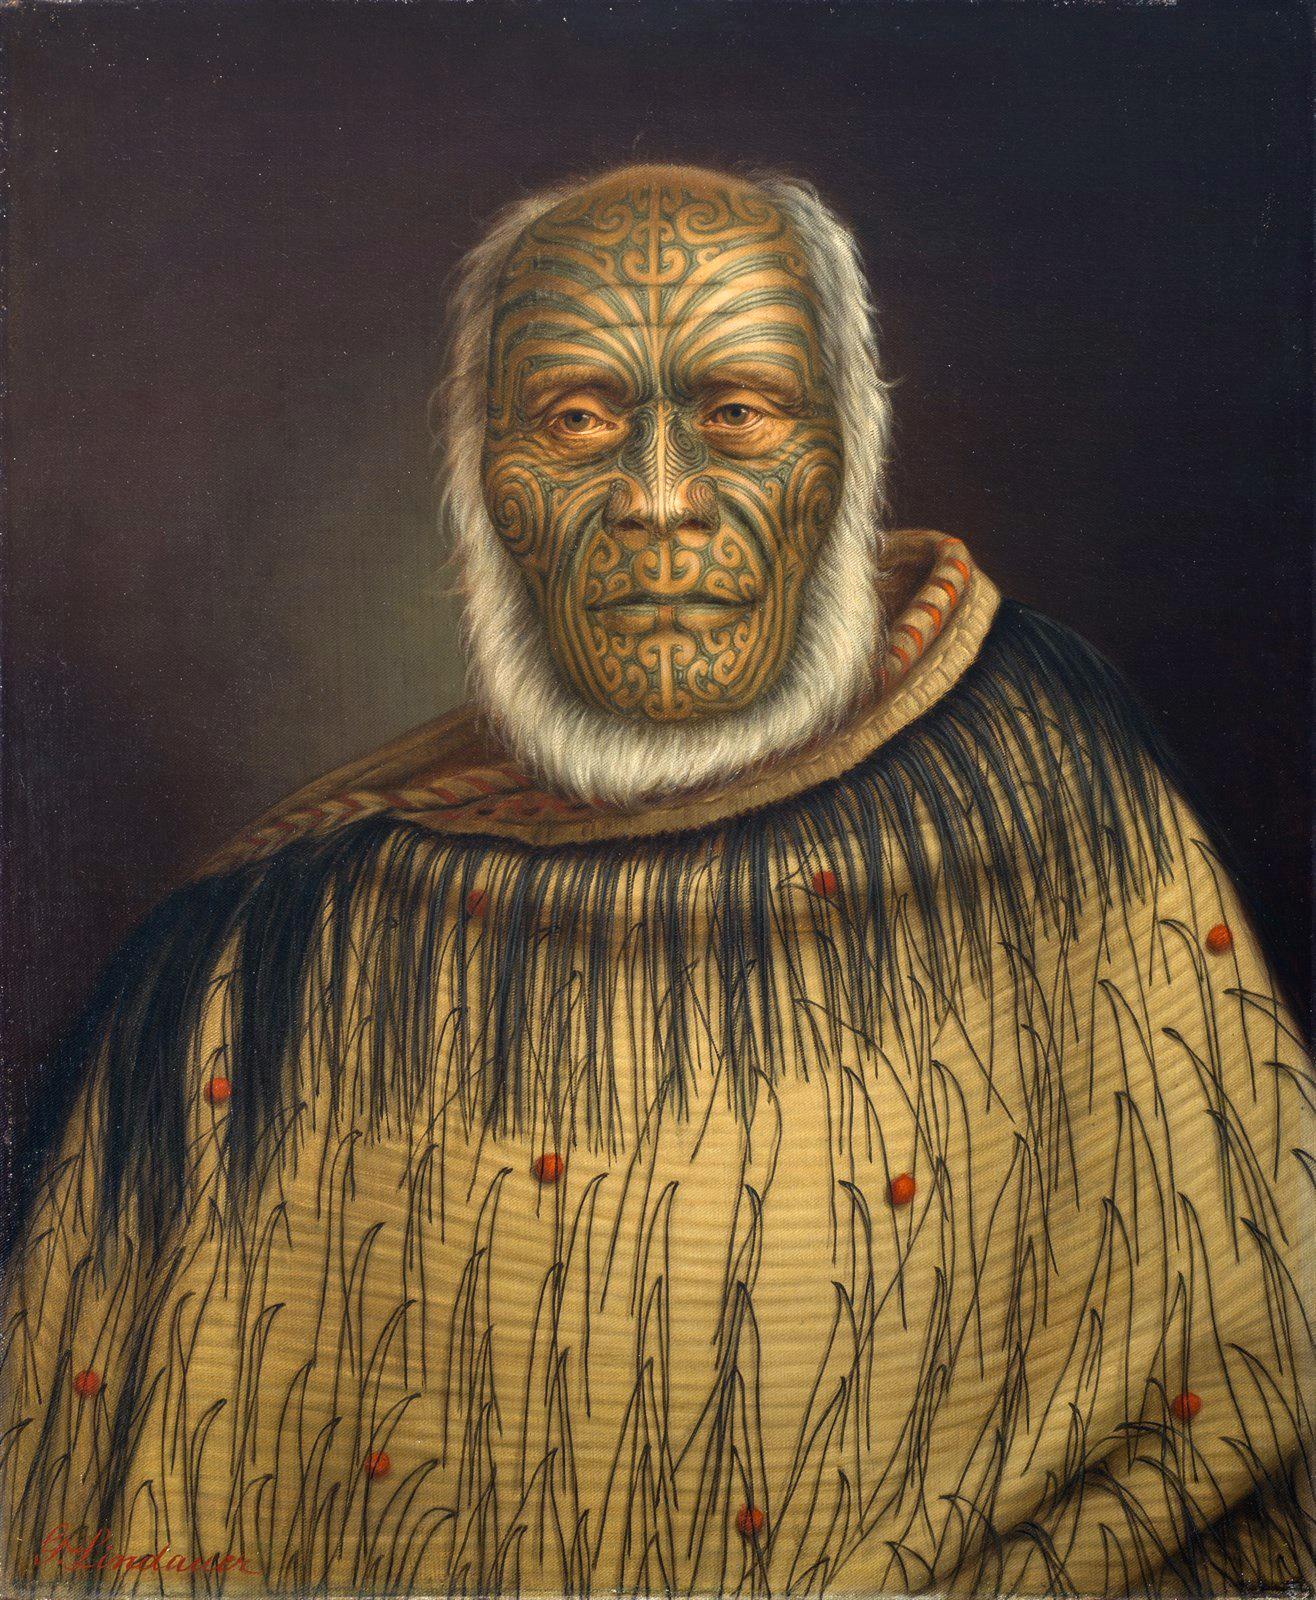 Gottfried Lindauer. Portrait of Ihaka Whanga. 1870. Oil on canvas. Auckland Art Gallery